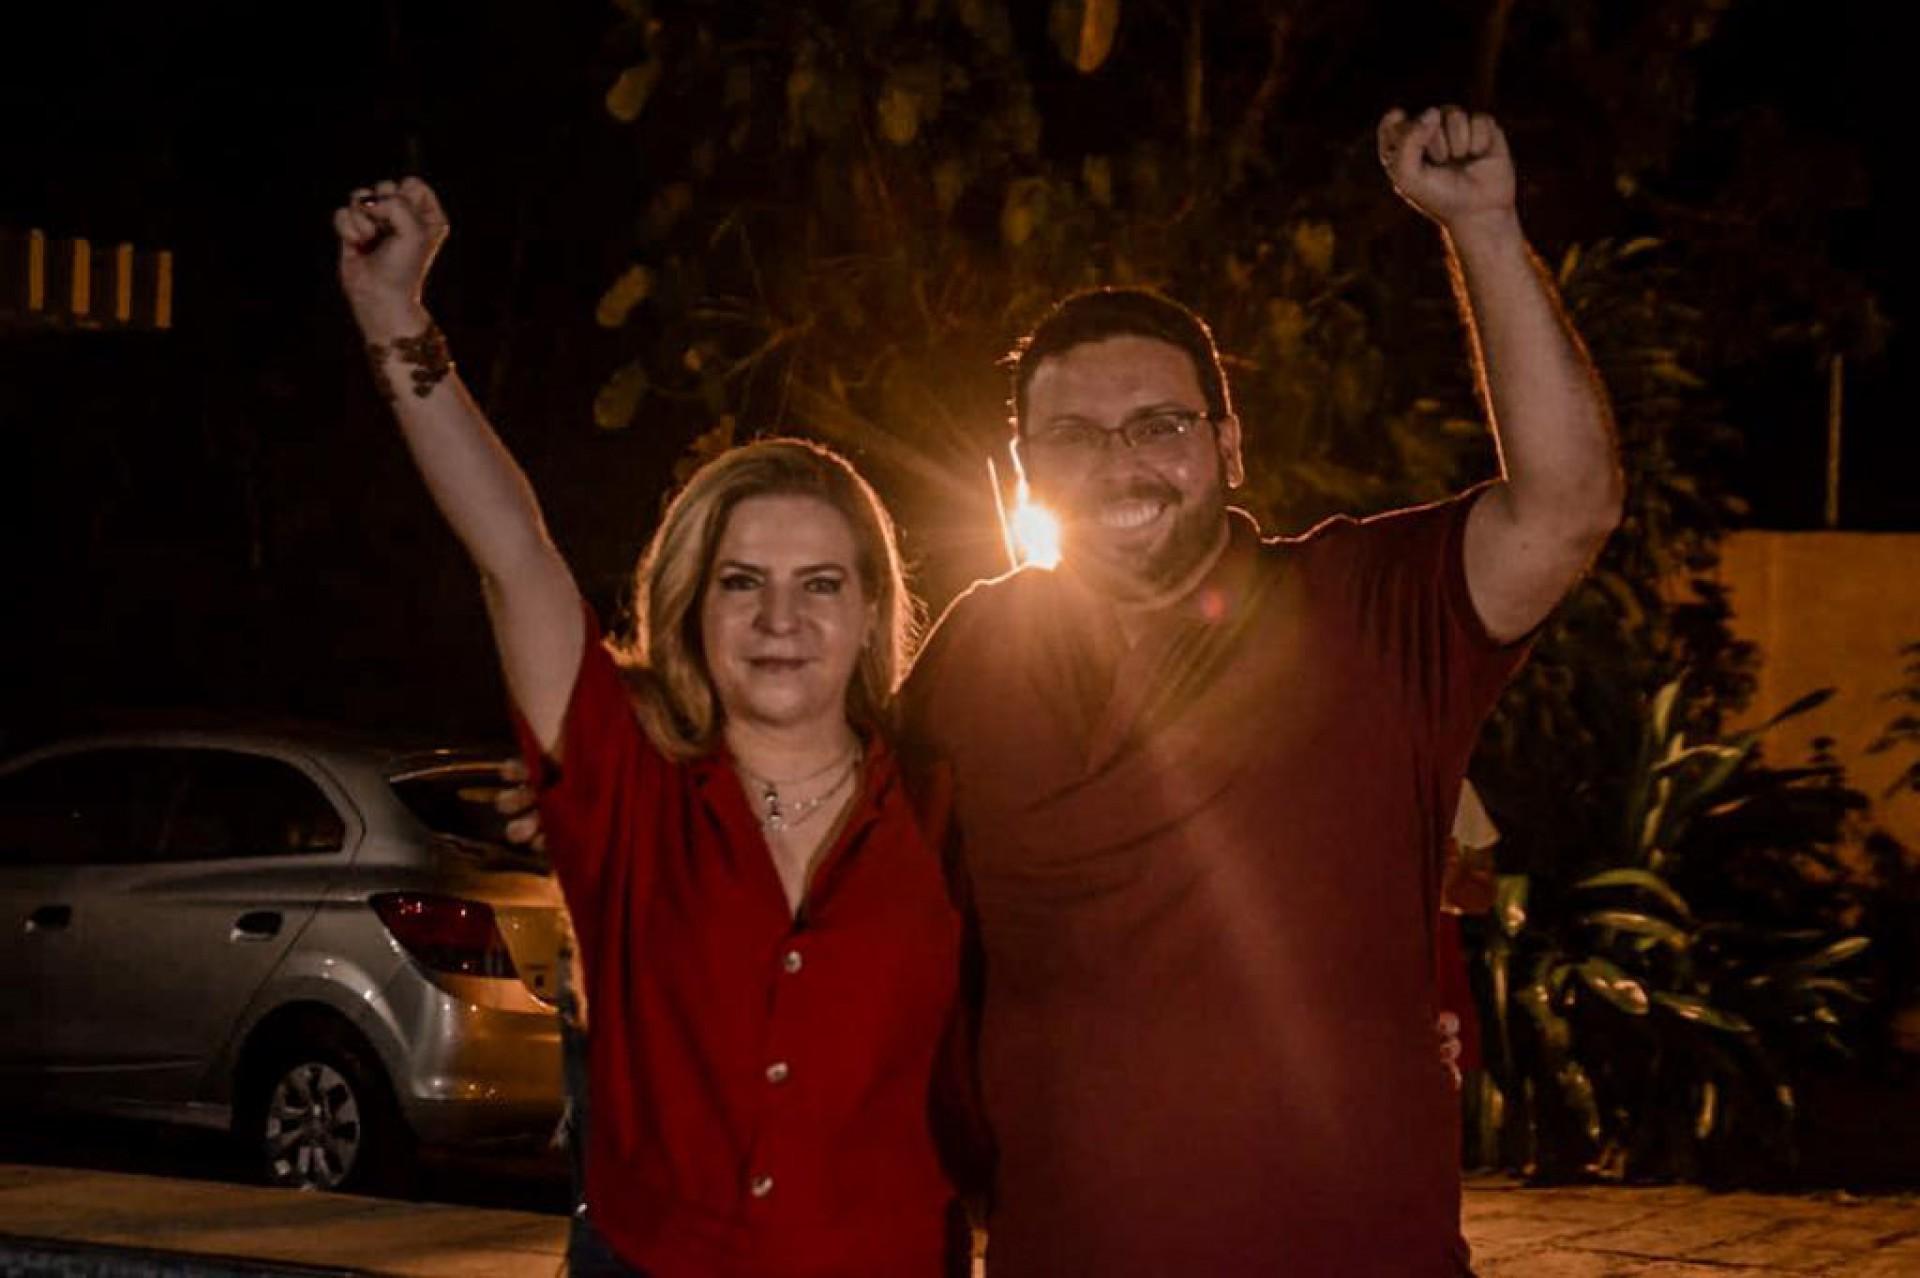 PT lançou candidatura à Prefeitura de Fortaleza com Luizianne Lins e Vladyson Viana